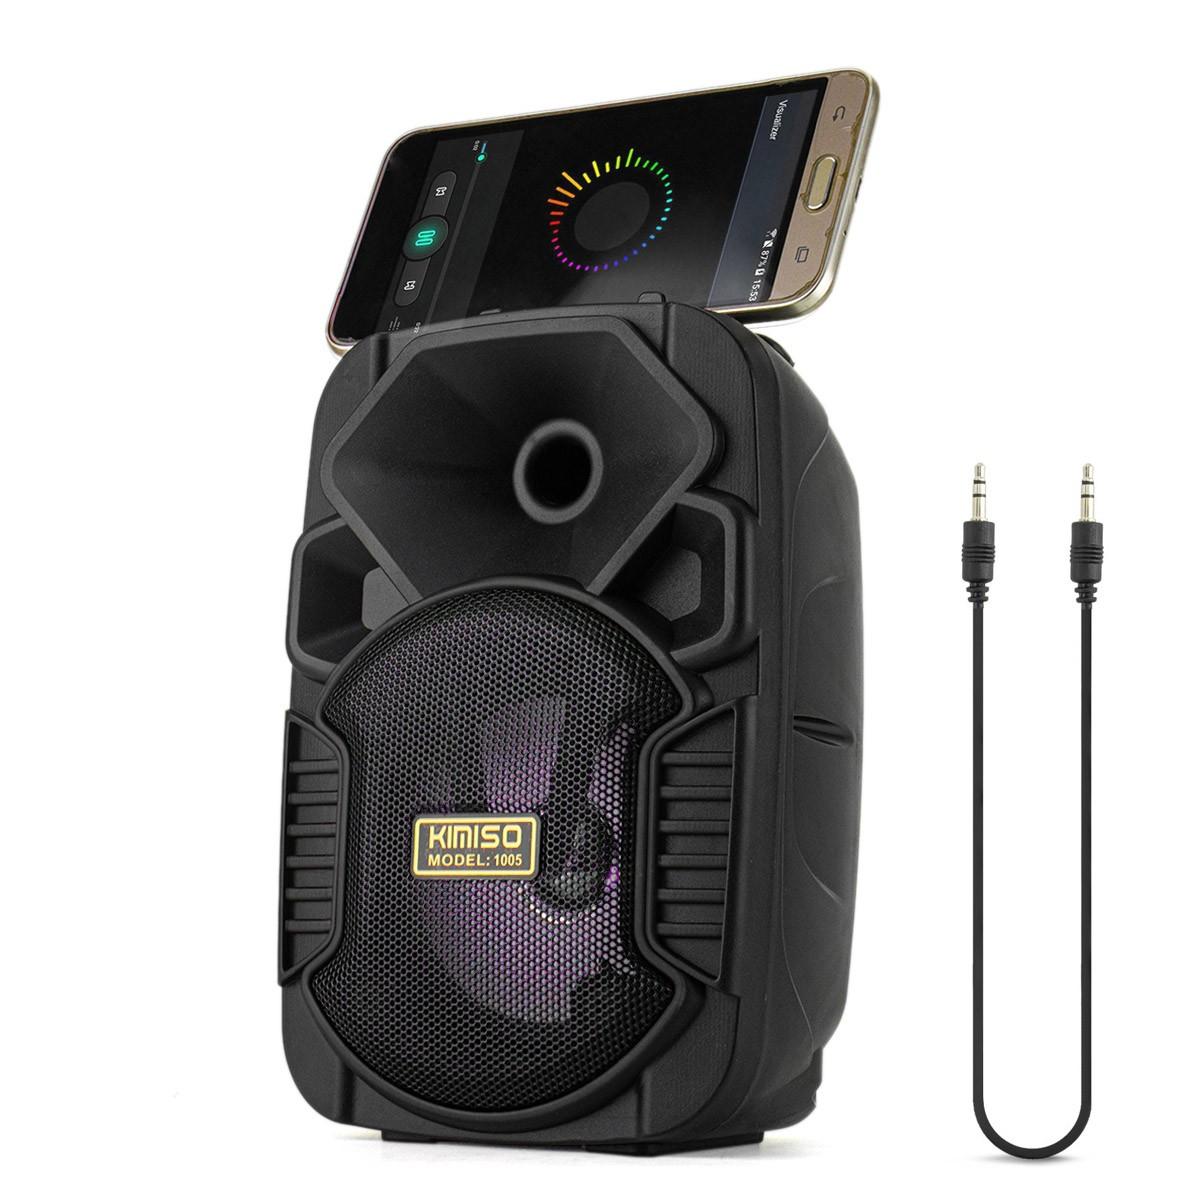 Caixa de Som Bluetooth Portátil 5 Watts RMS com Cabo Auxiliar P2 Entrada USB Micro SD Kimiso KMS-1005